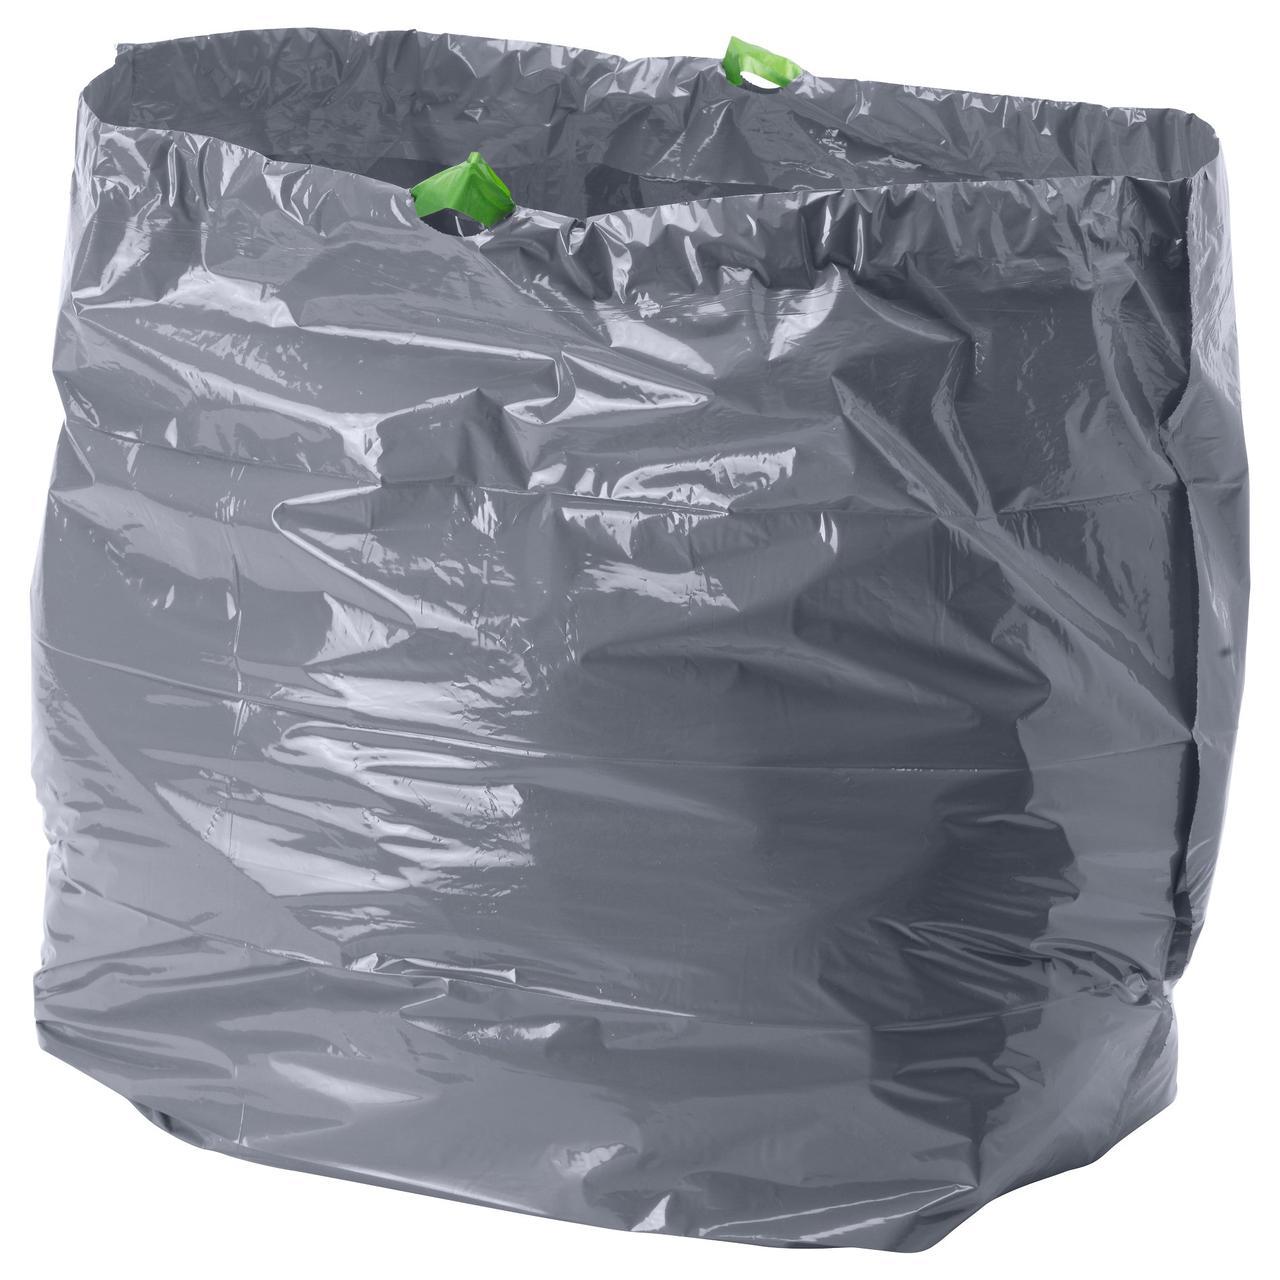 ФОРСЛУТАС Мешок для мусора, серый